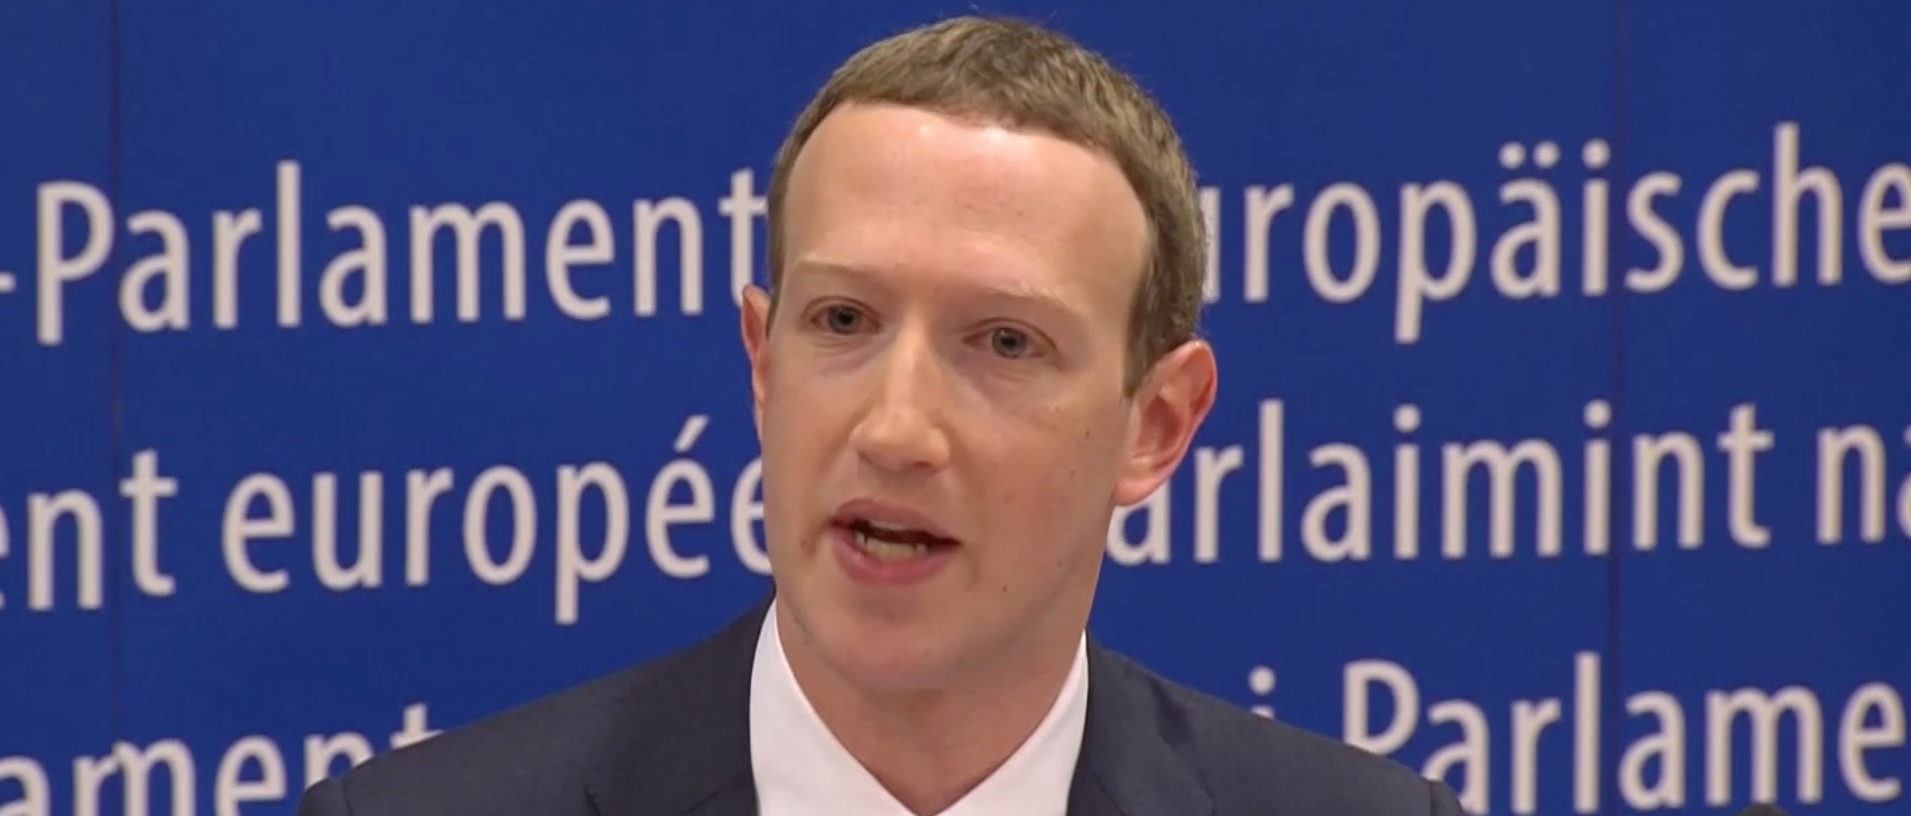 Facebook Hires Daily Telegraph to Praise Them REUTERS/ReutersTV